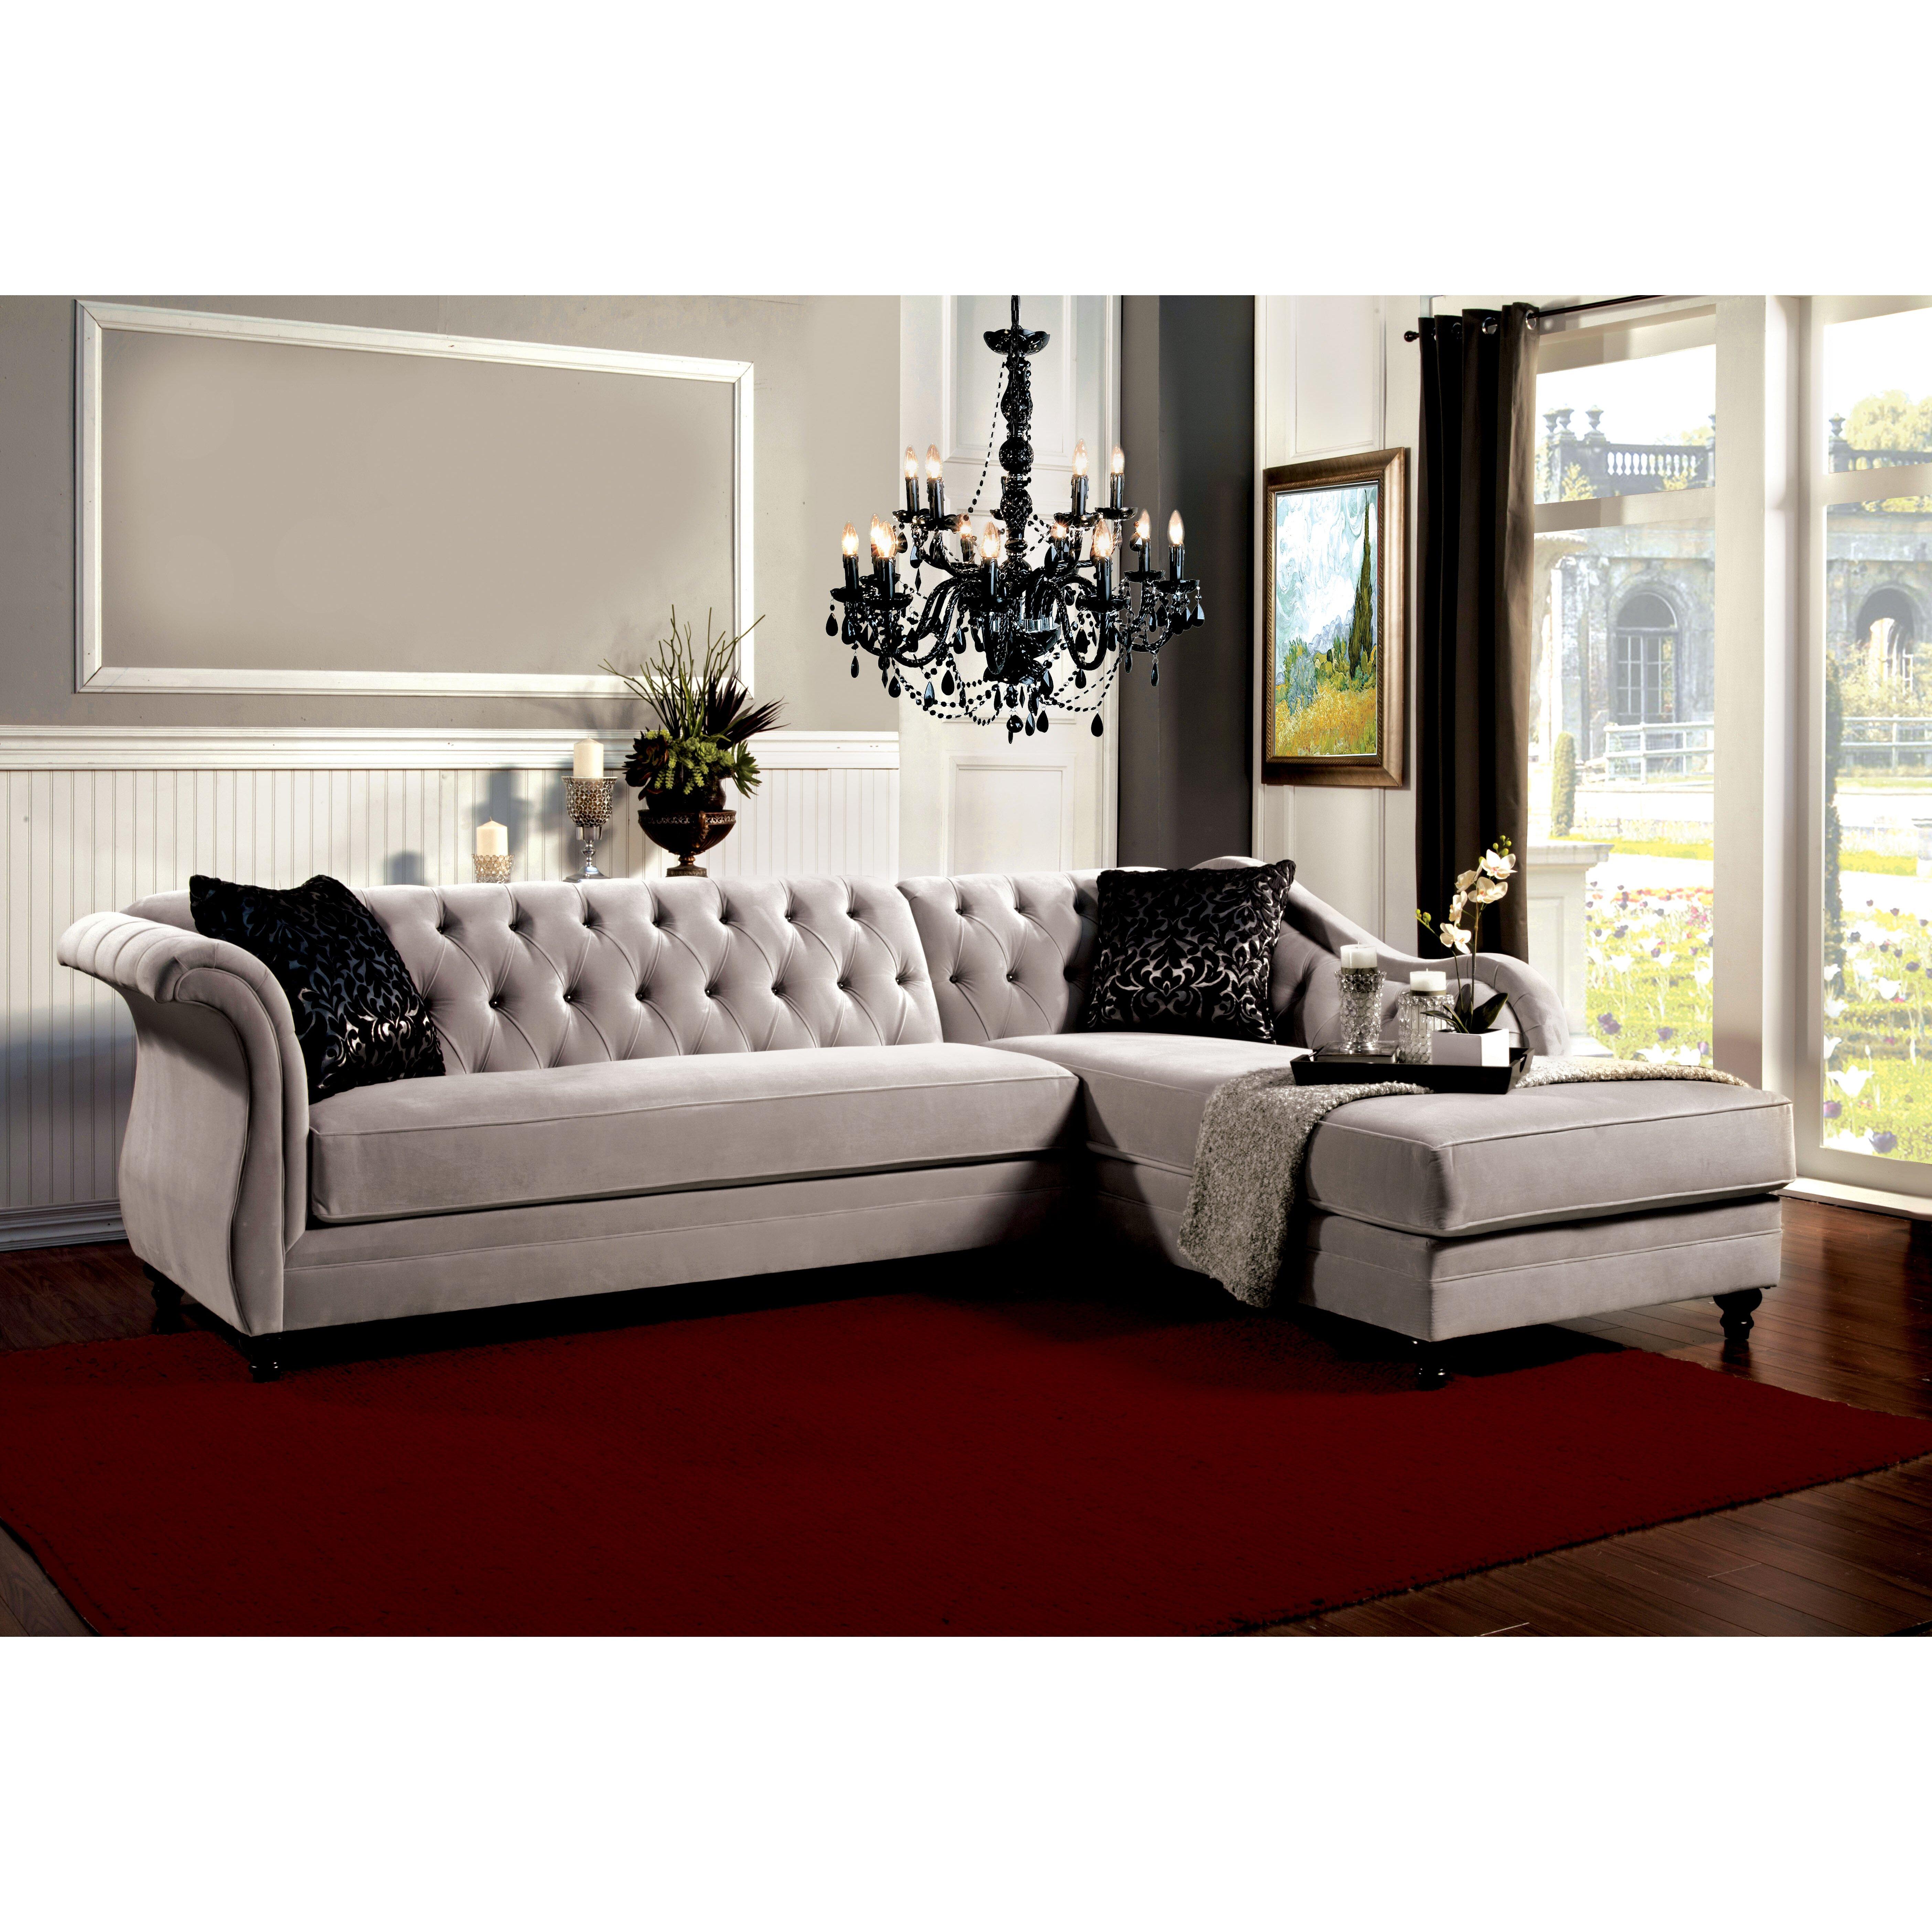 Hokku designs hartmann sectional reviews wayfair for Hokku designs living room furniture